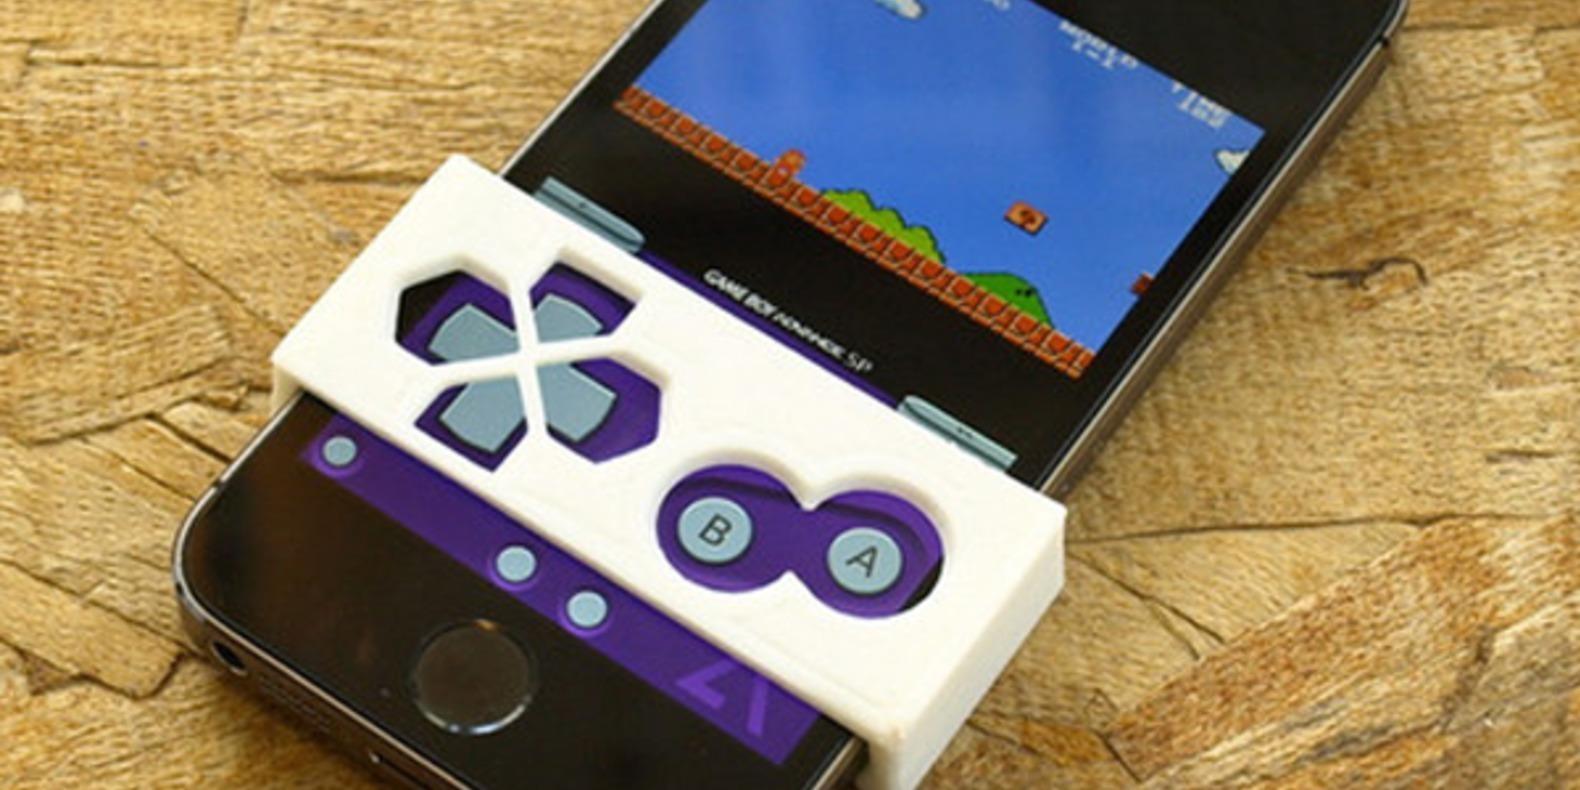 14.Boutons_Gameboy-3DBrooklyn jouets imprimés en 3D